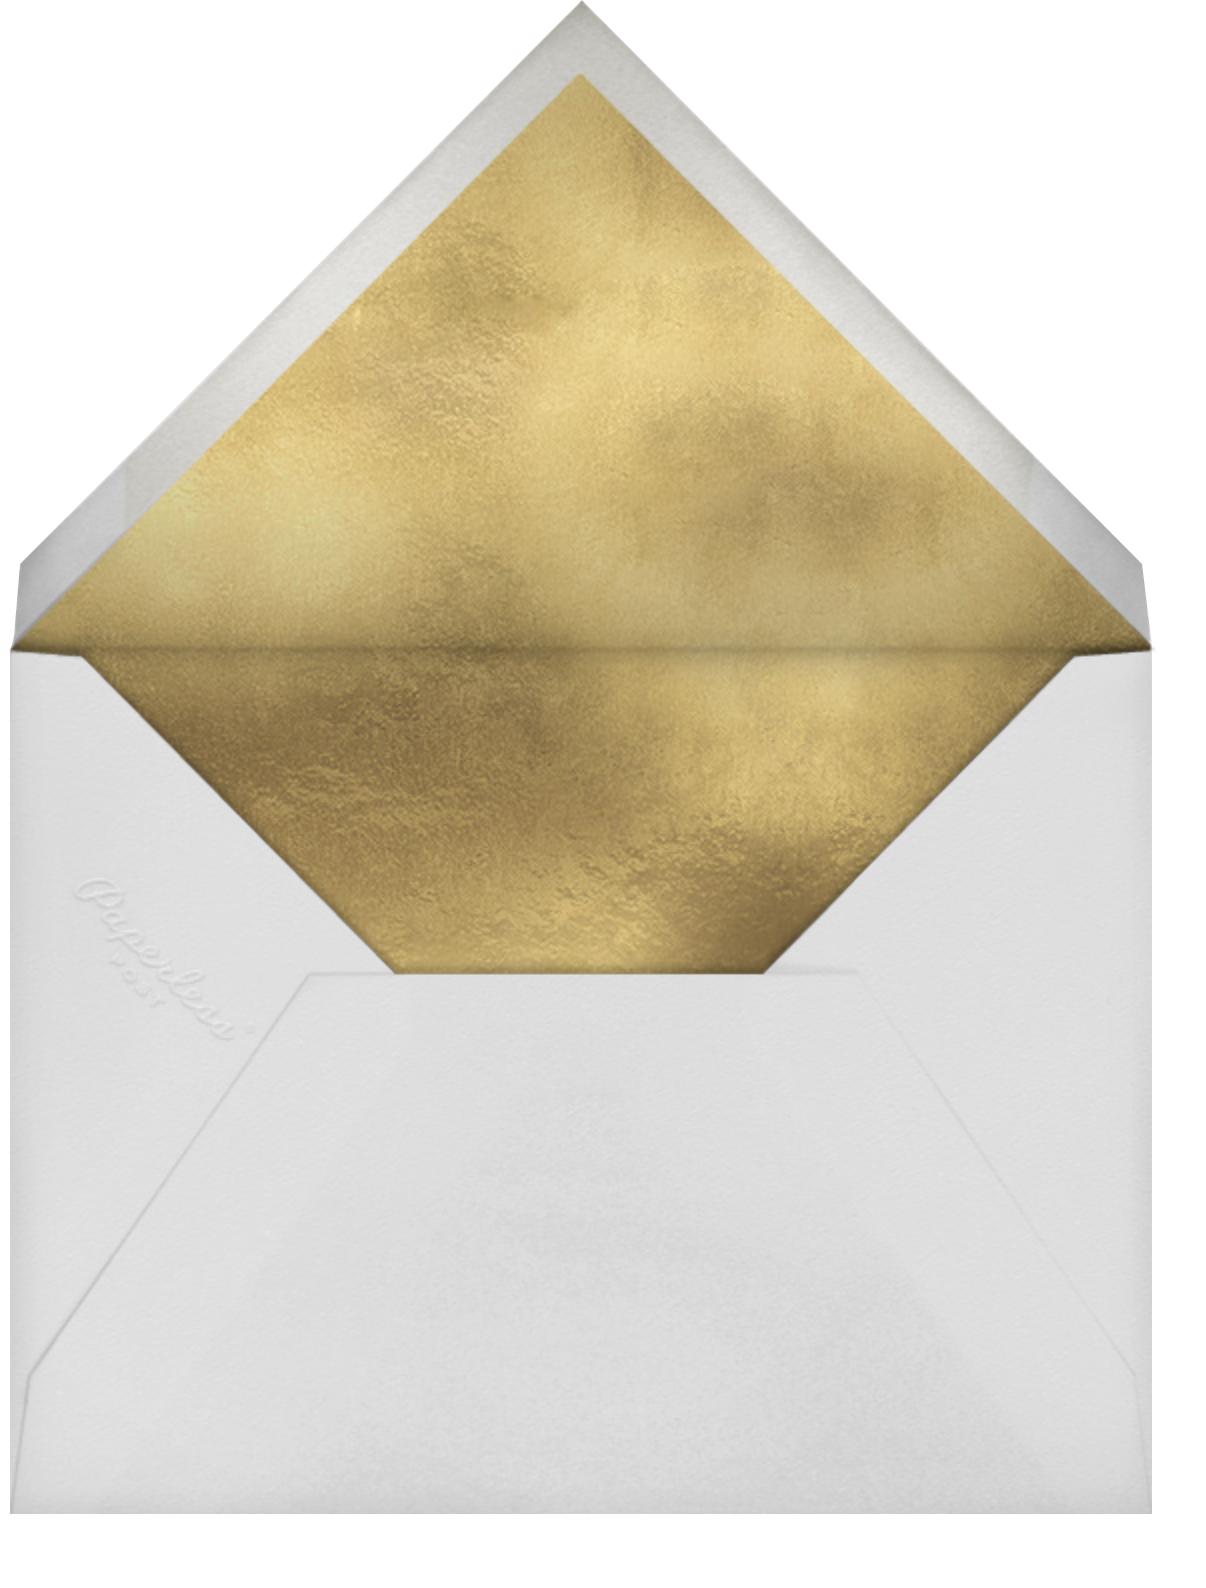 Sky Glitter - Black - kate spade new york - Holiday cards - envelope back